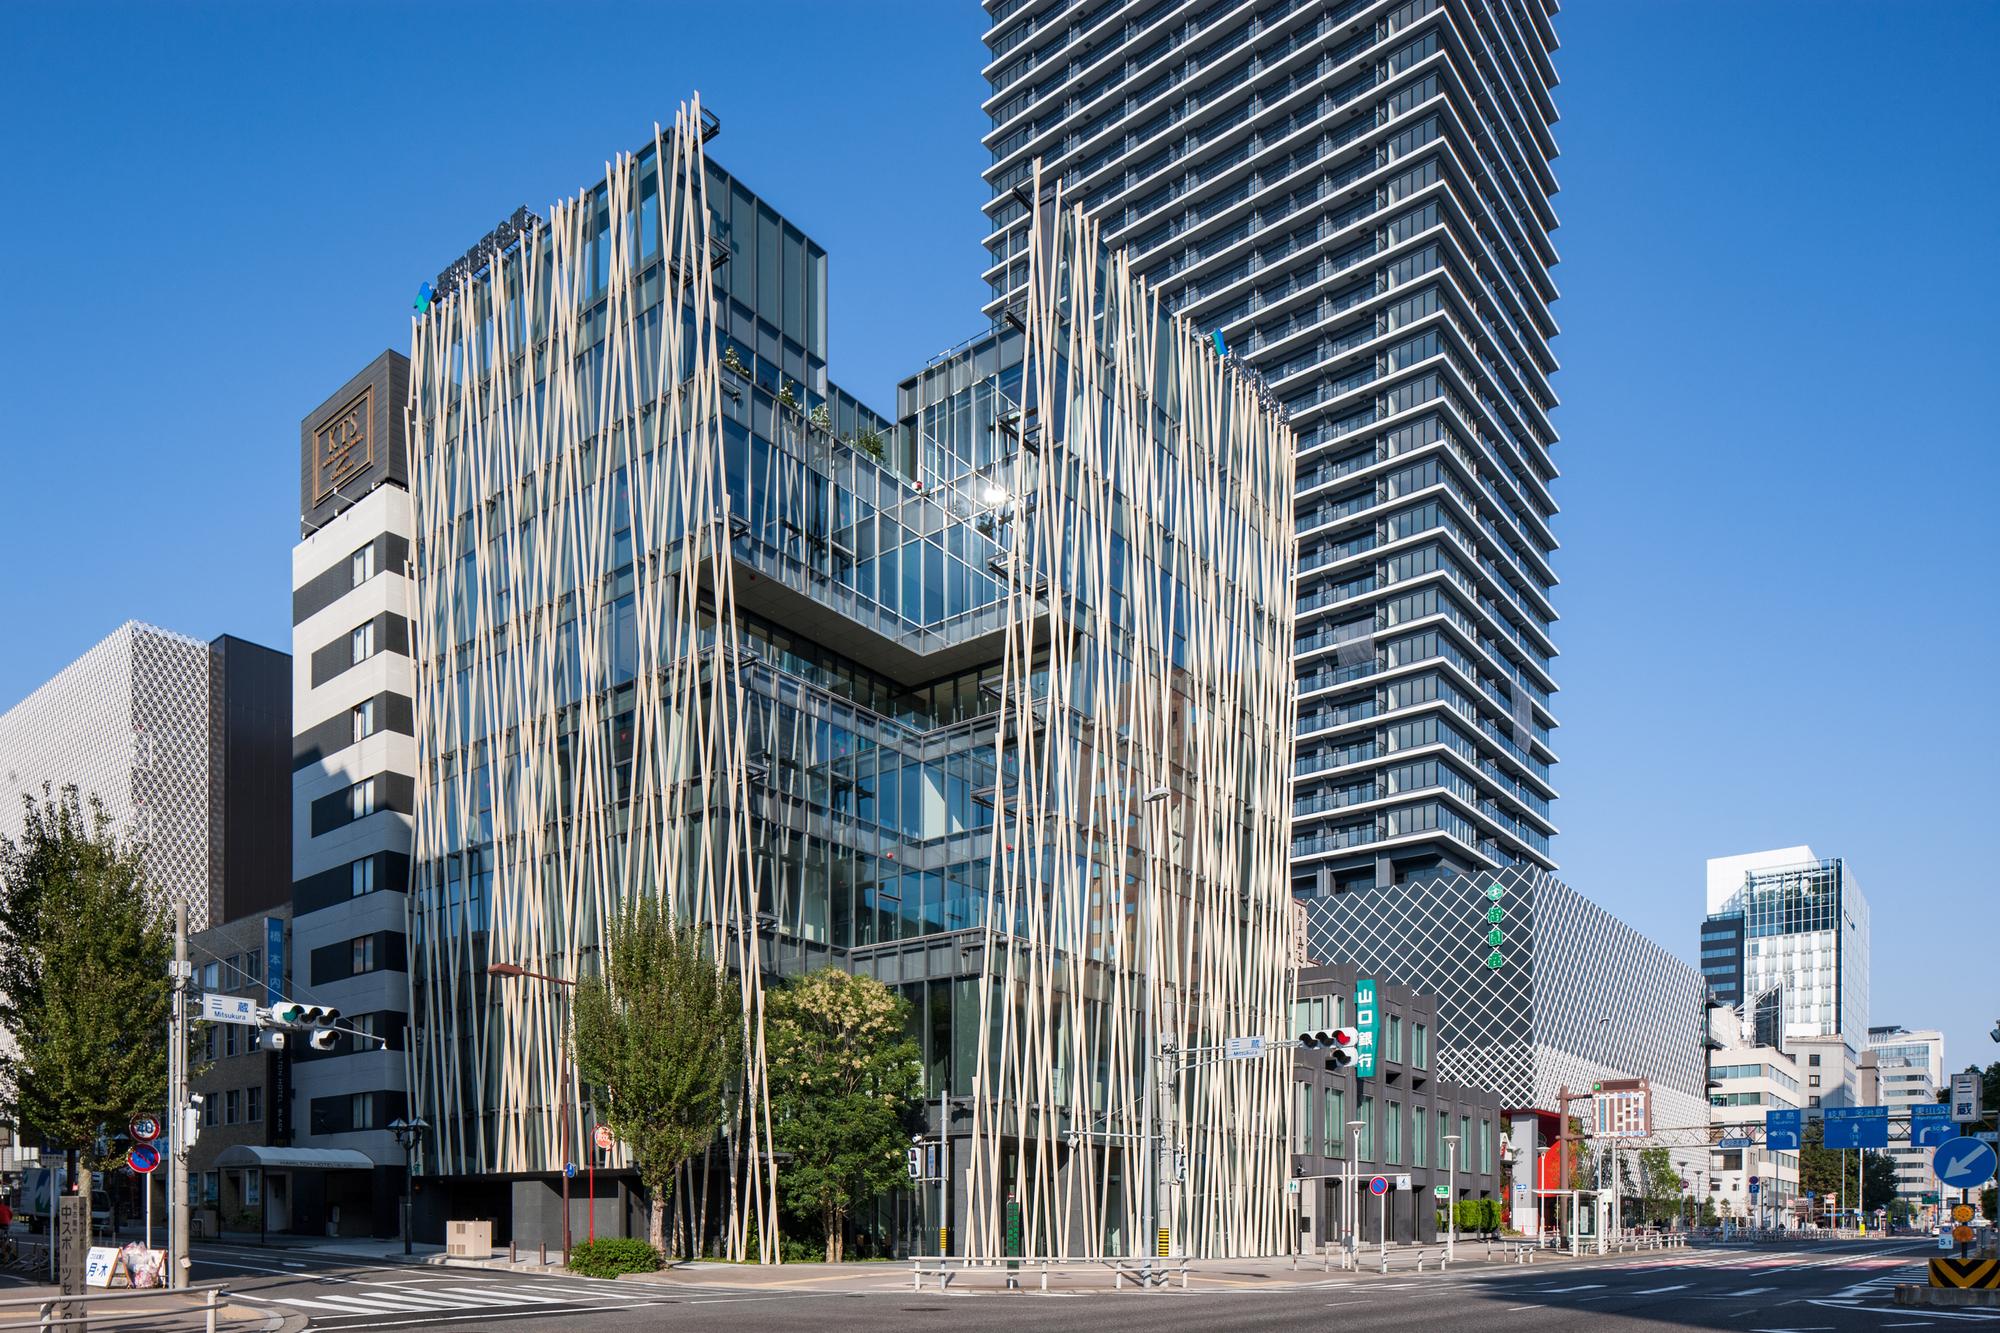 Hekikai Shinkin Bank Misono / Kengo Kuma and Associates